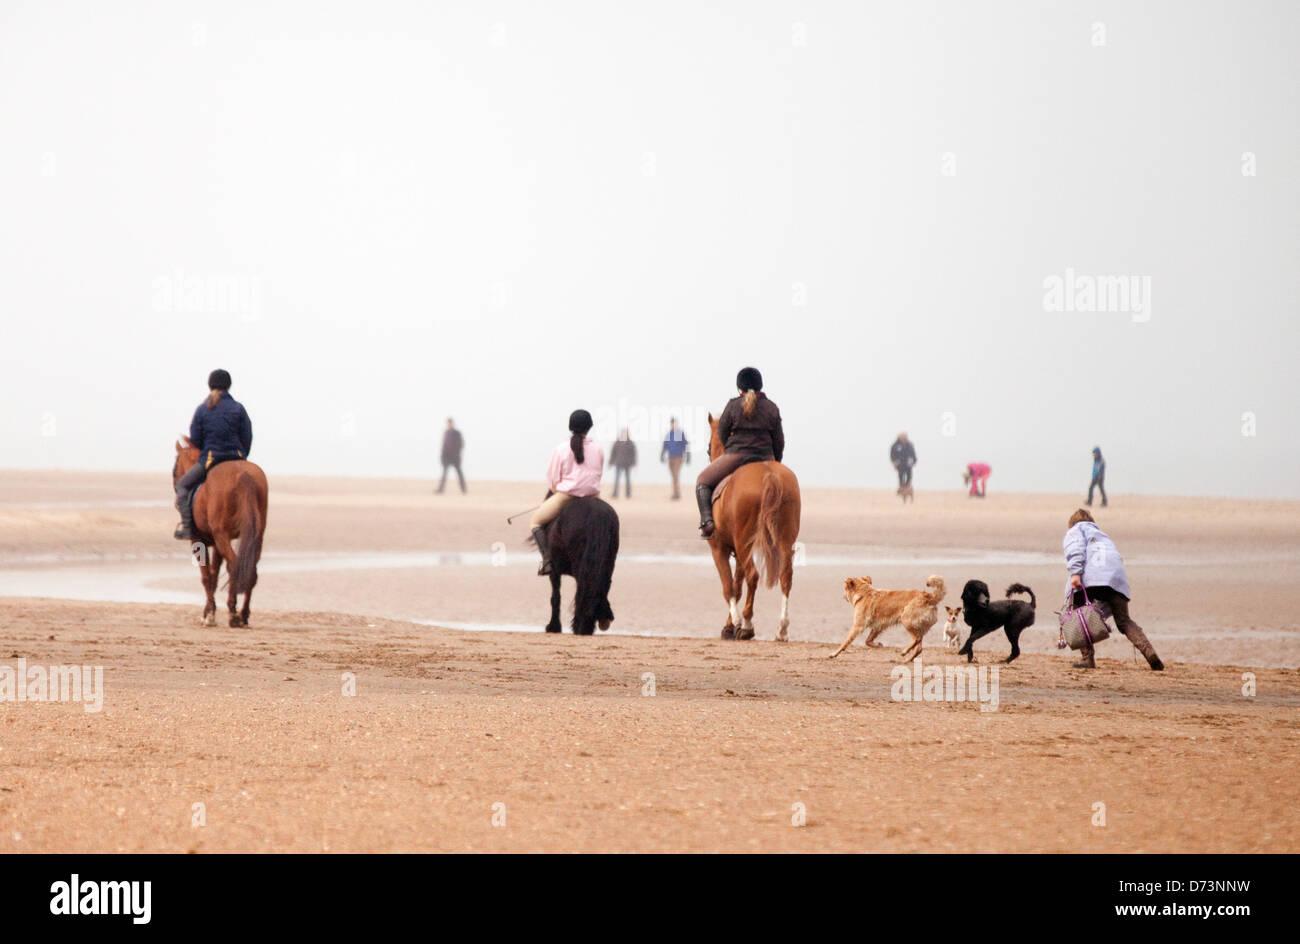 People walking, riding horses and walking dogs, Holkham beach, Norfolk, East Anglia England UK - Stock Image